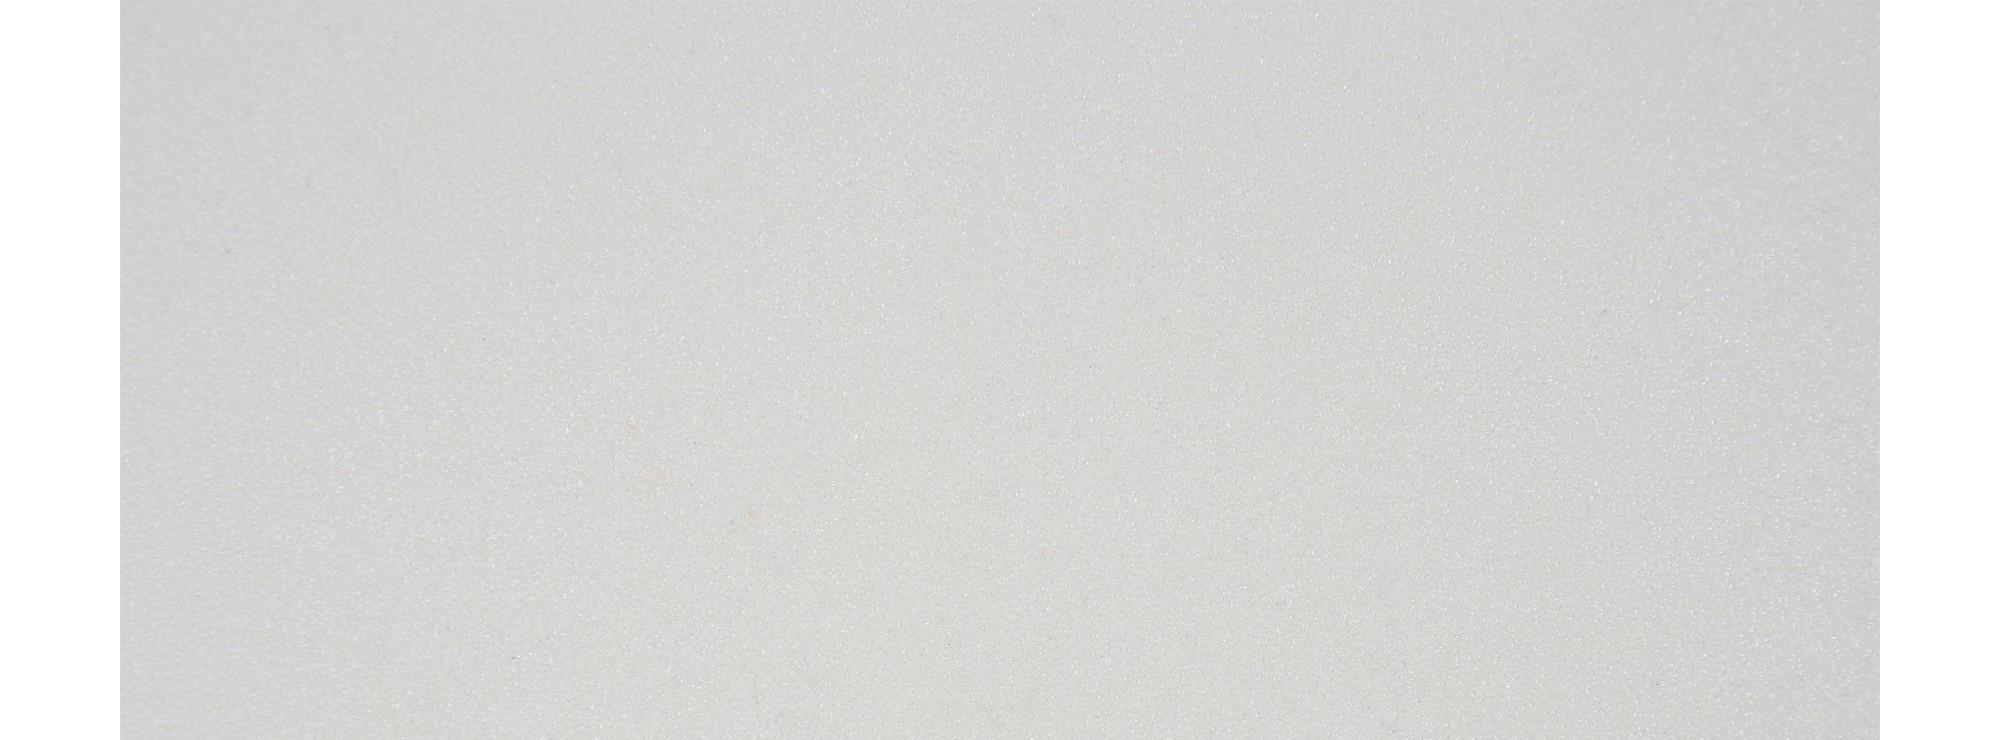 Kibri H0 34138  Betonplatte 20 x 12 cm